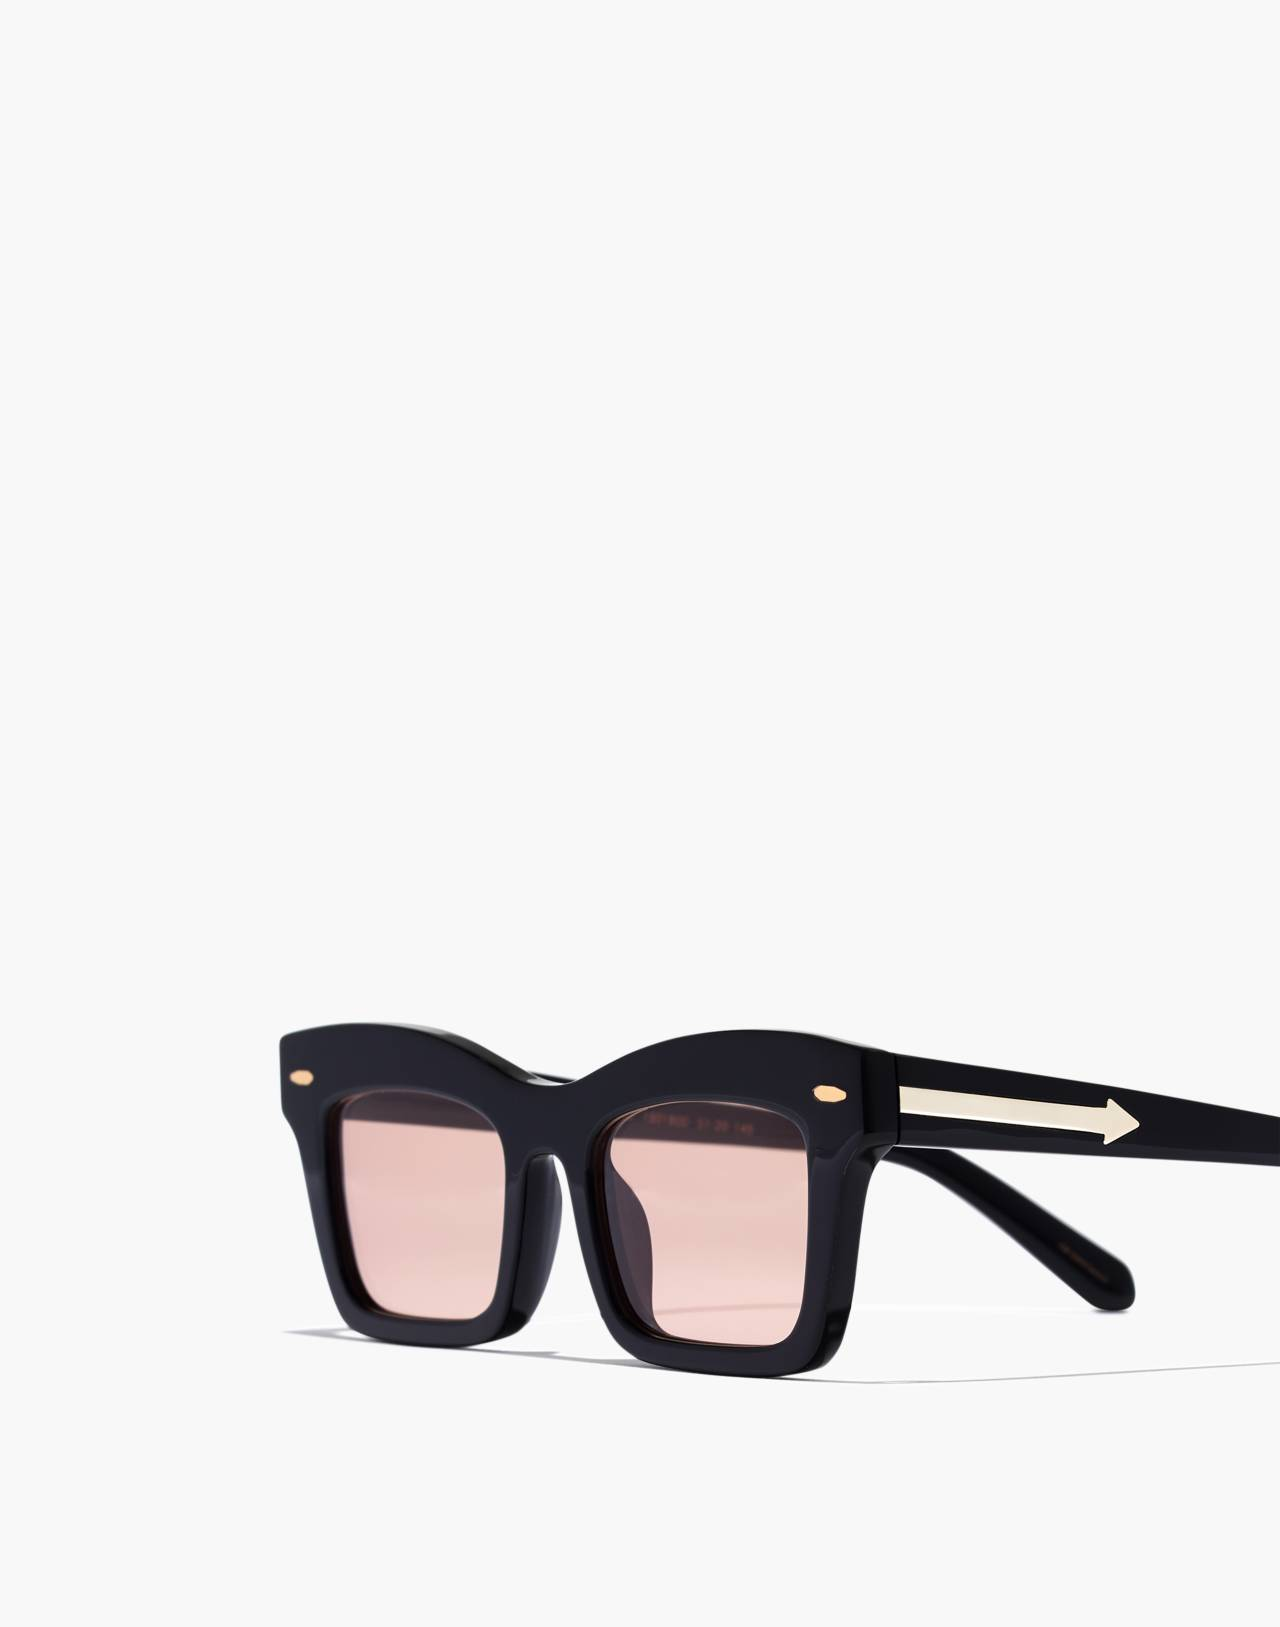 Madewell x Karen Walker® Banks Sunglasses in black image 2